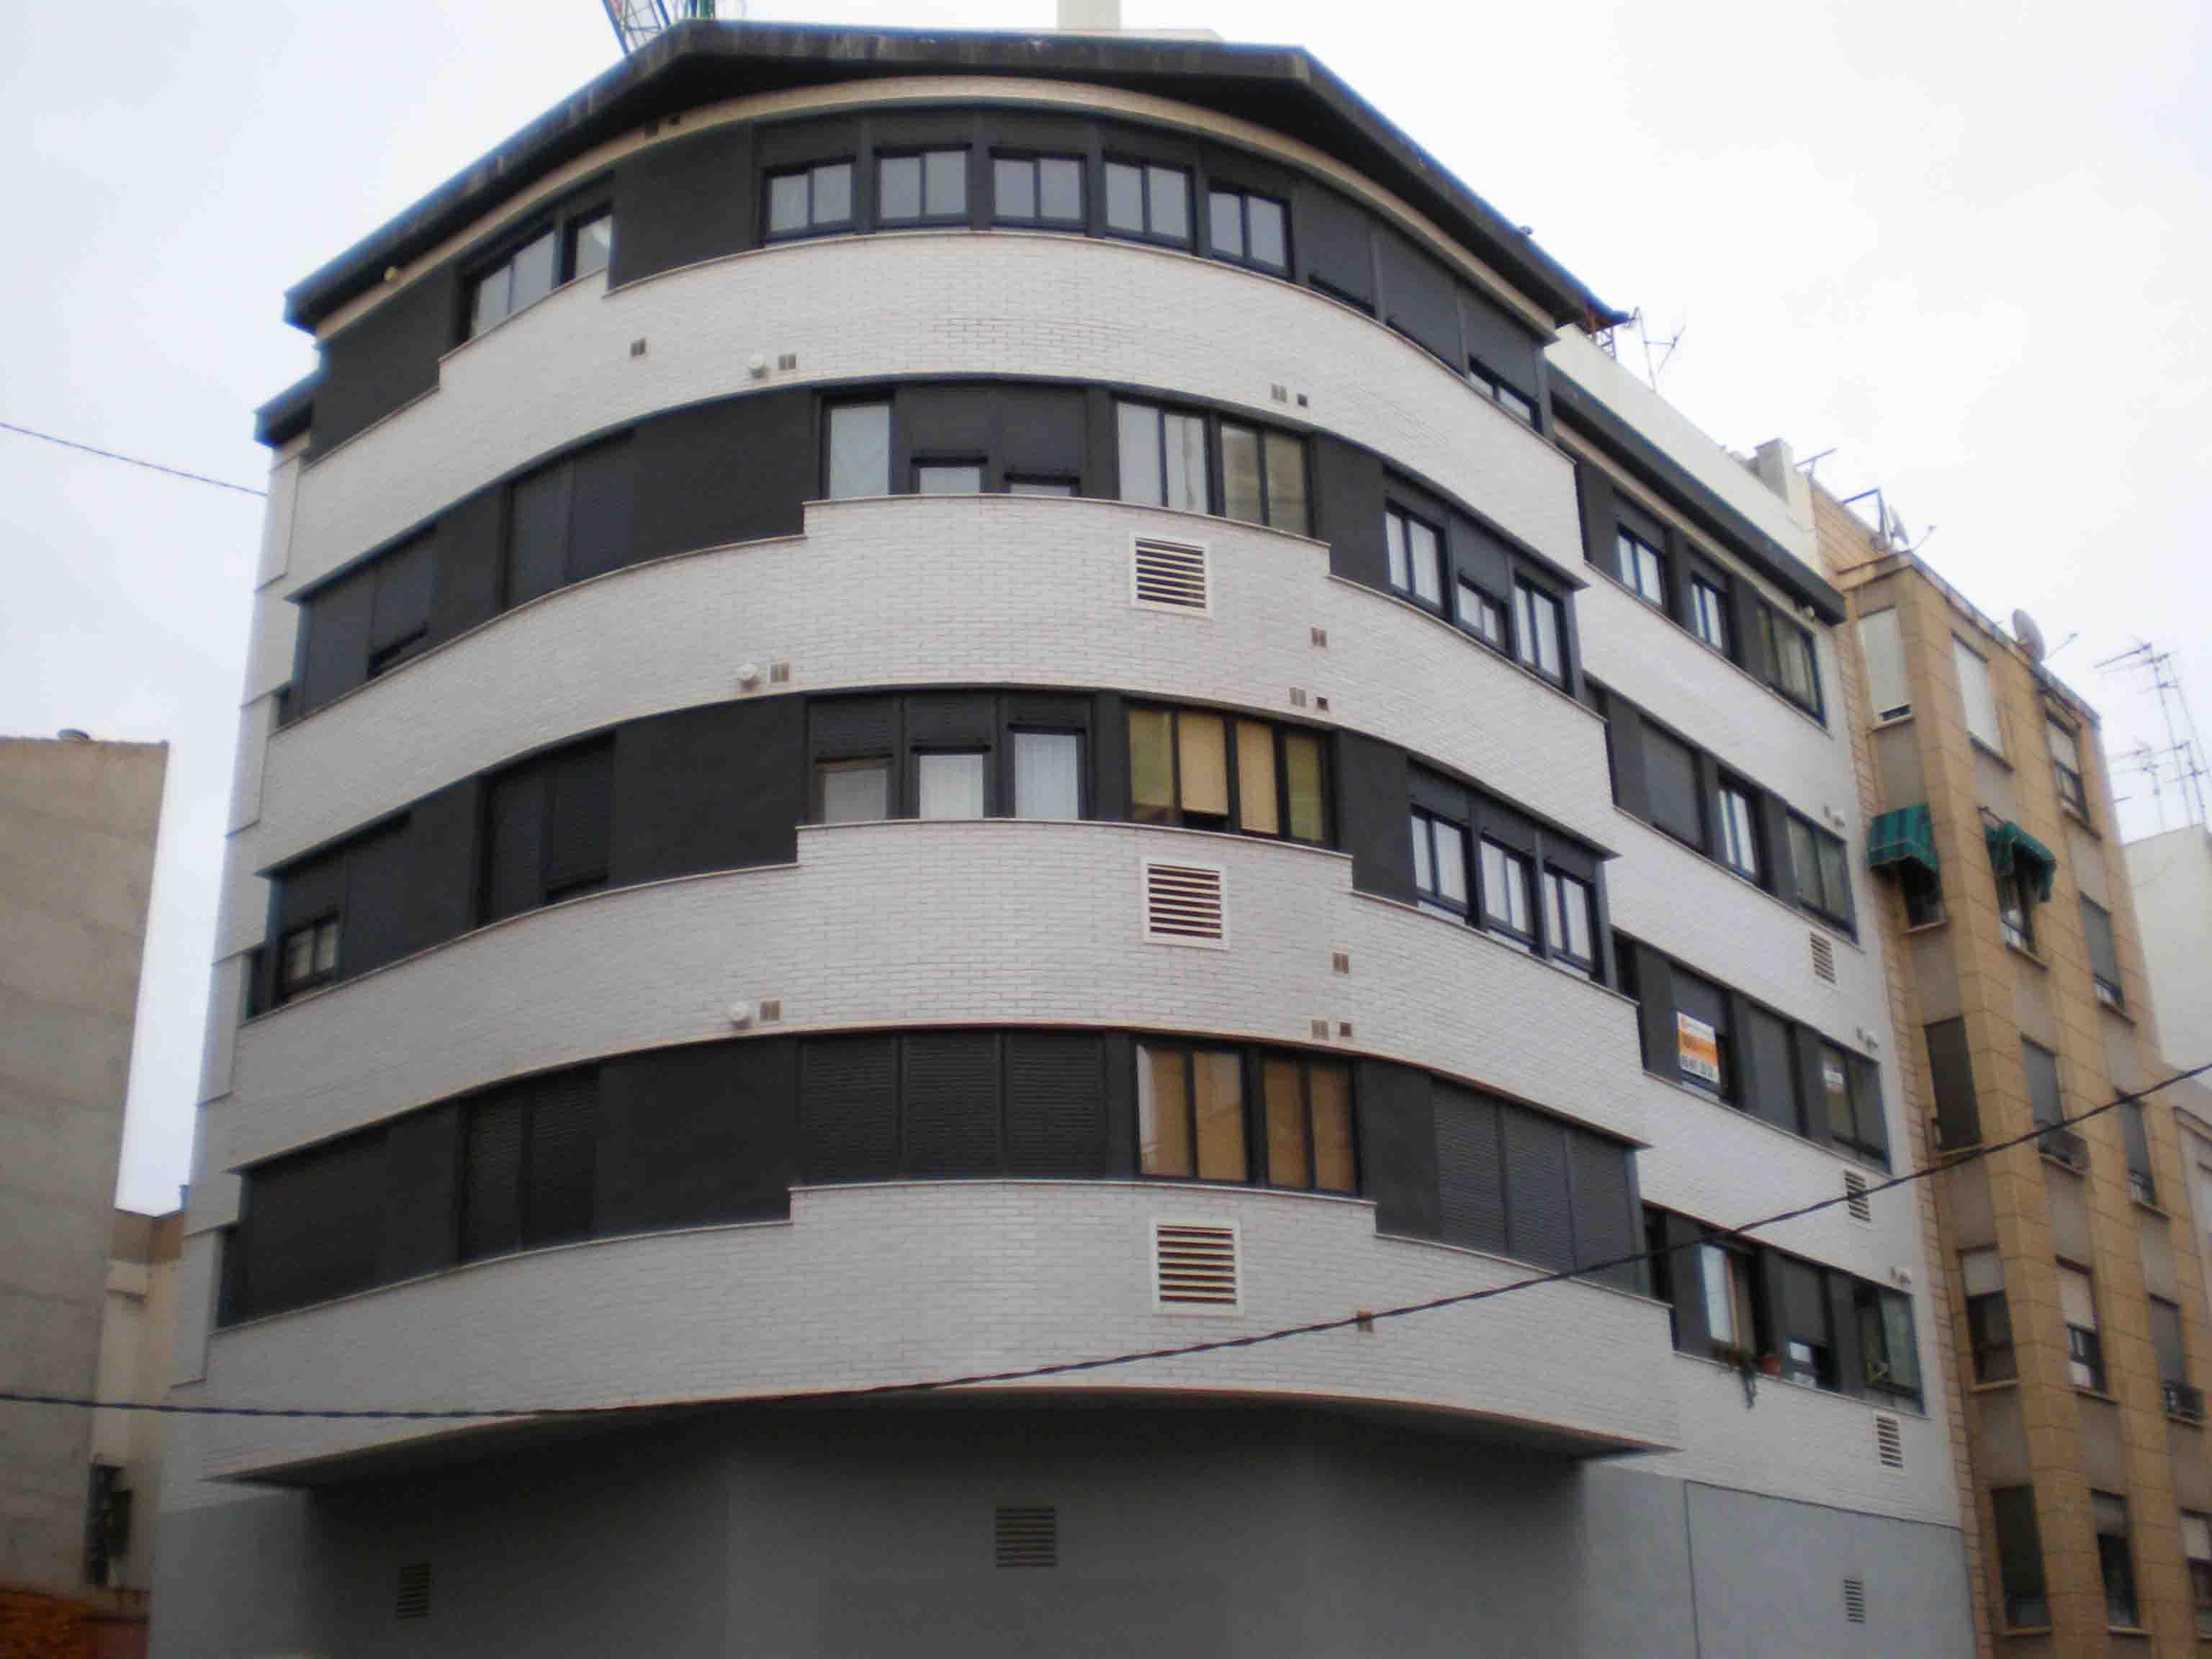 Edificio Casablanca